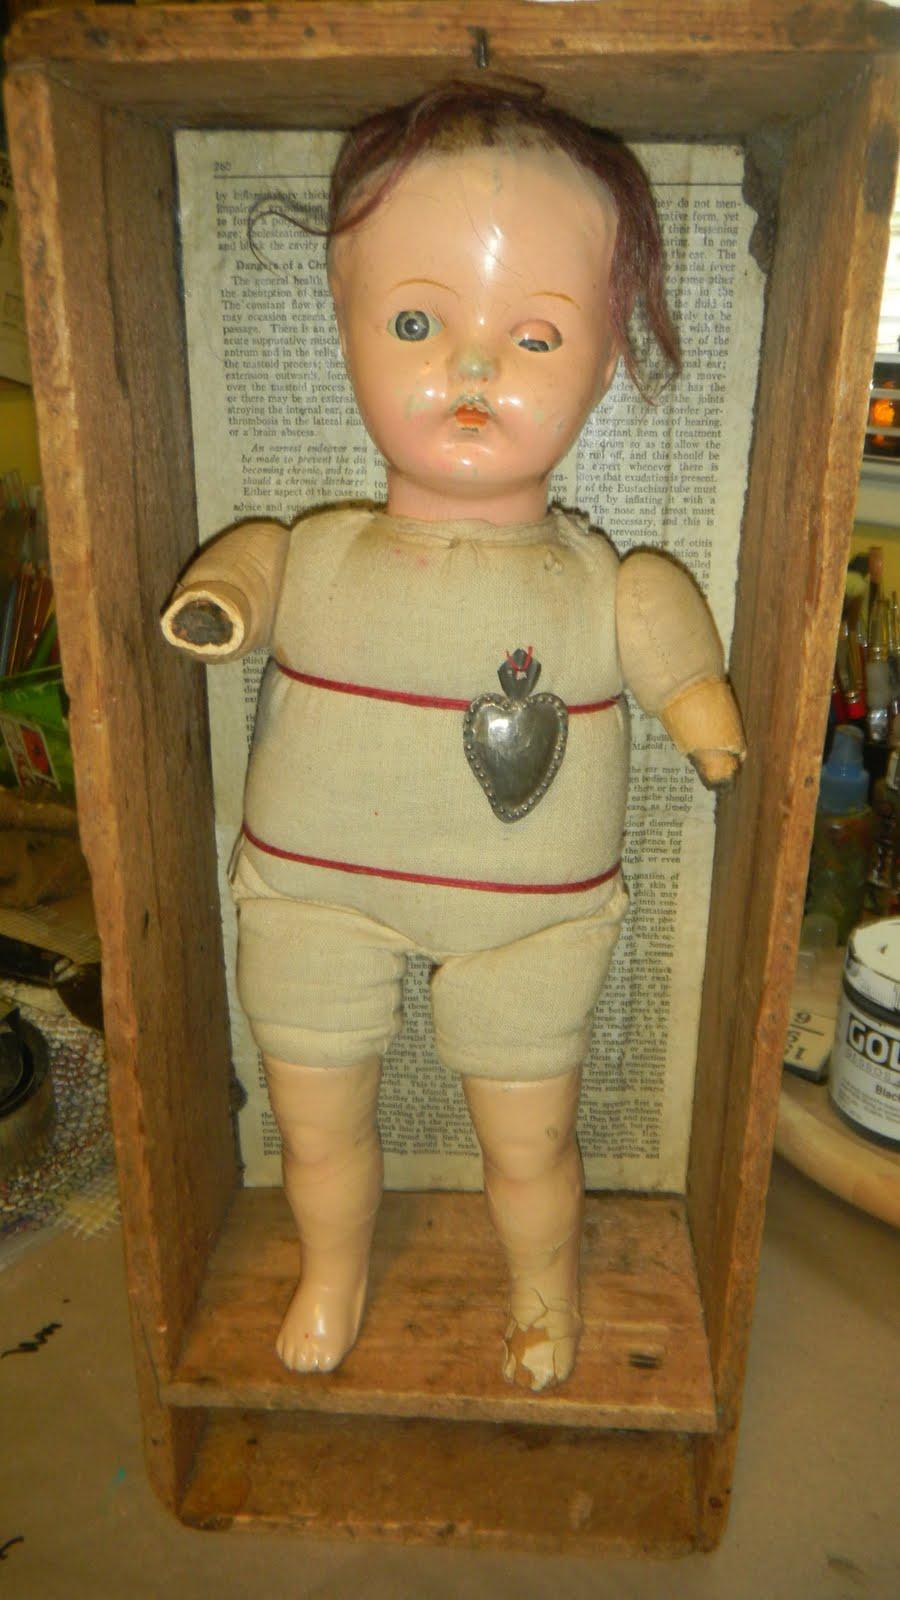 Alley Art Studio: Anatomy of a Creepy Doll: Meet Molly